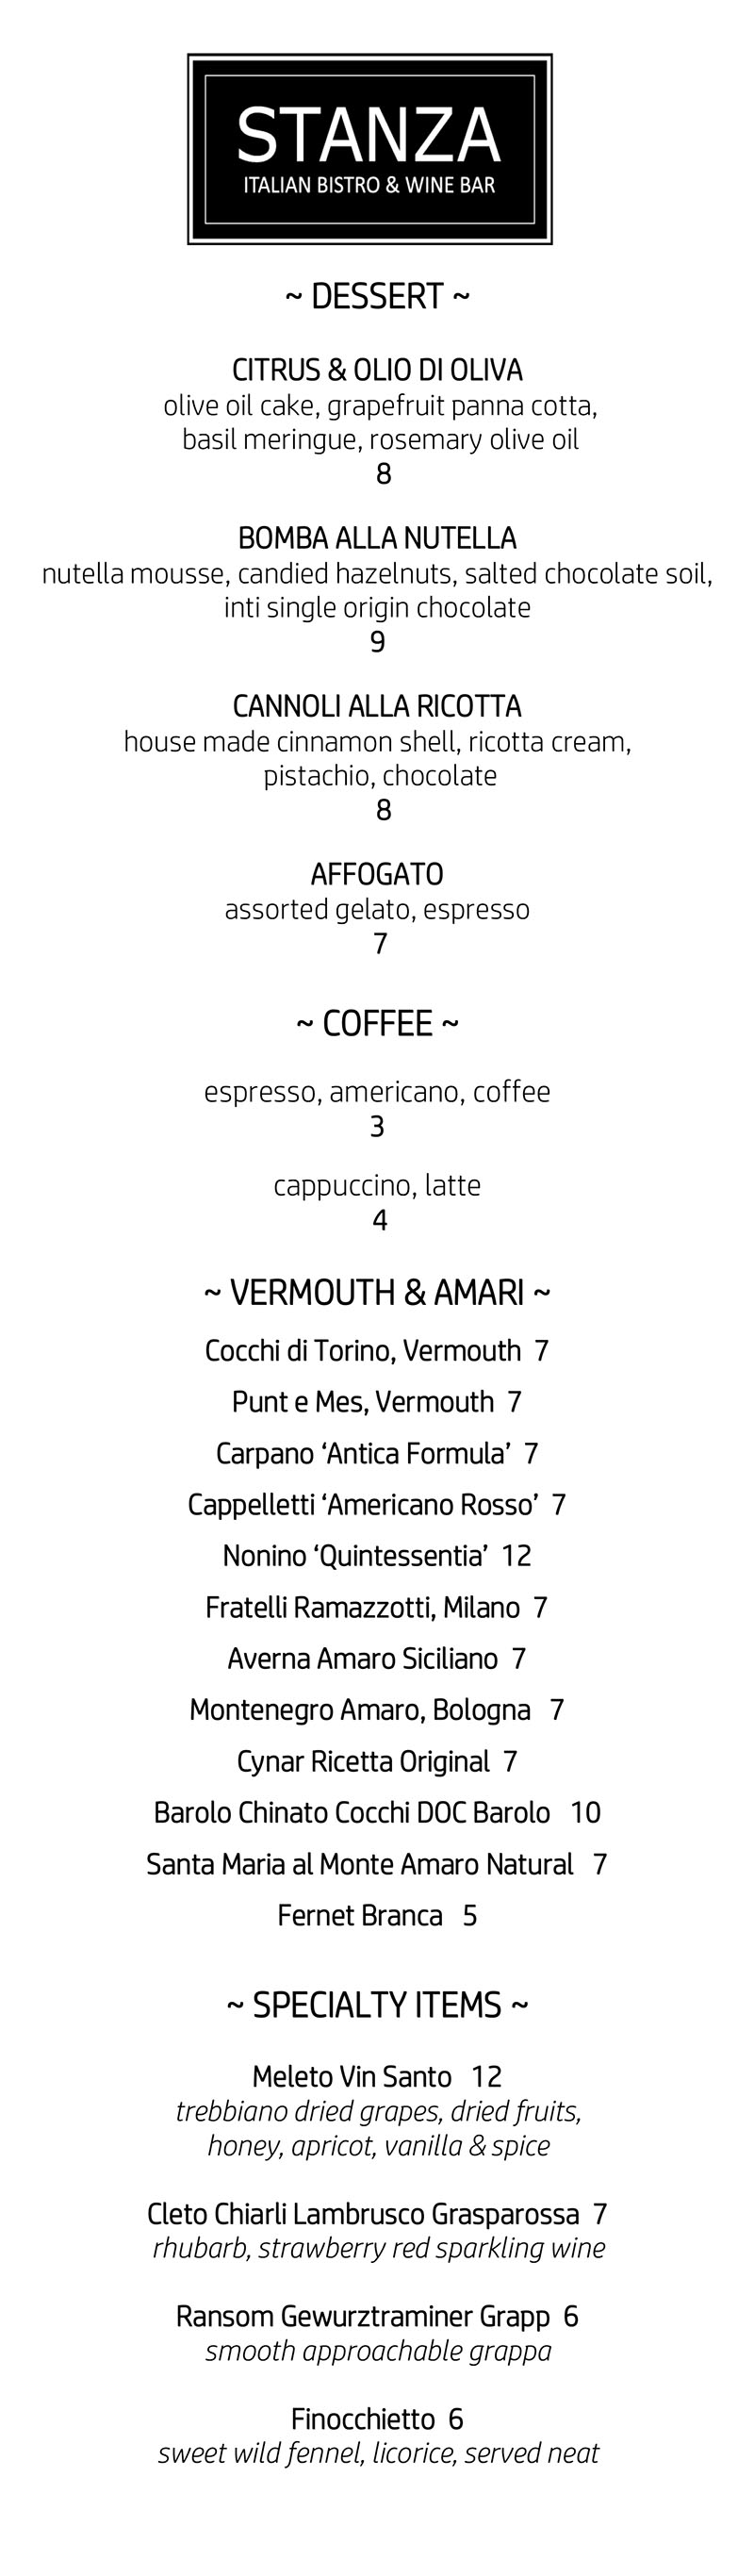 Stanza Italian Bistro - dessert menu